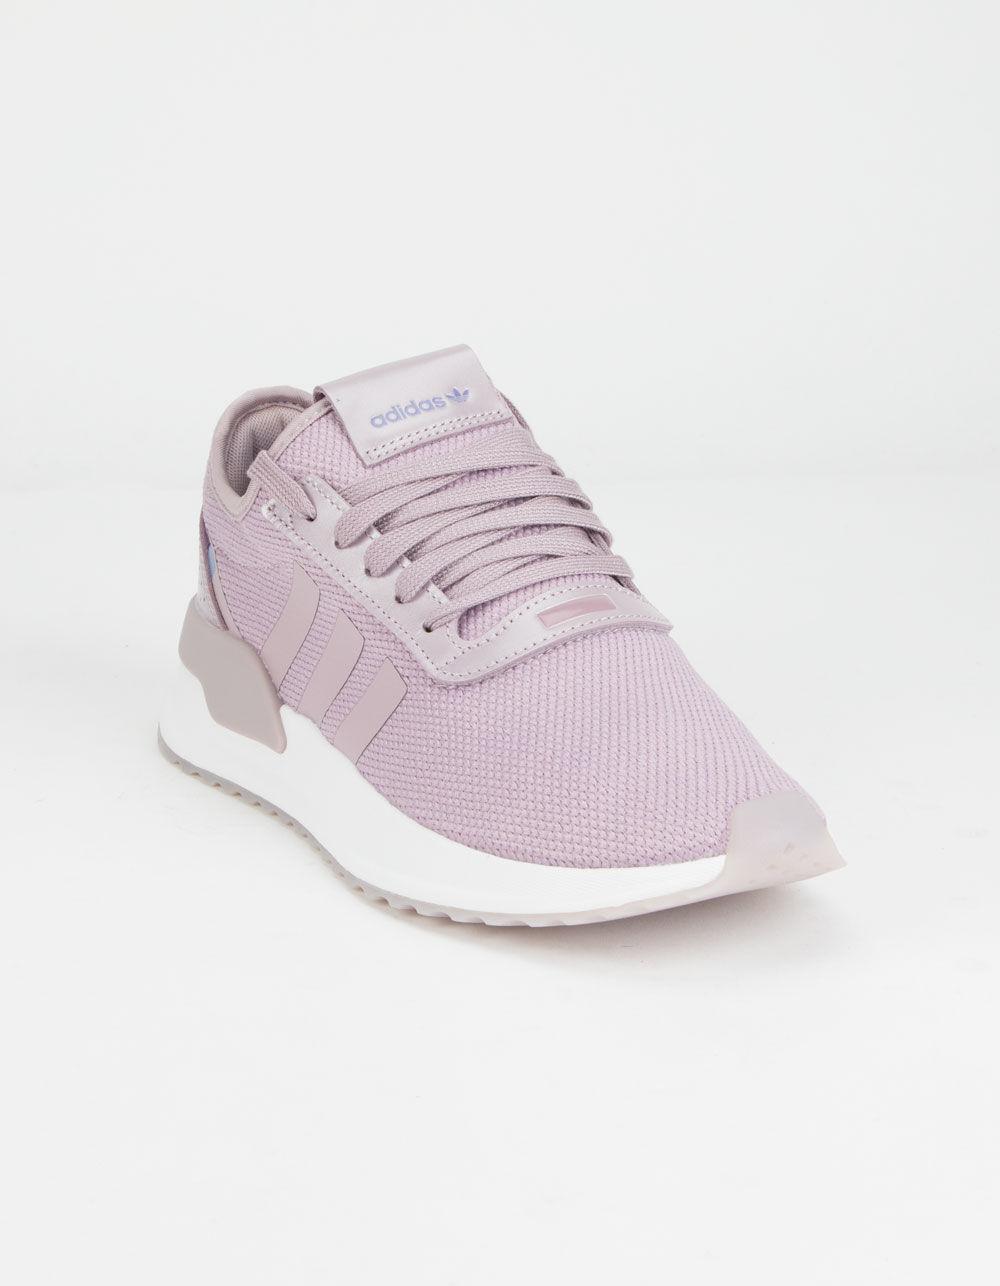 Details zu adidas U_Path X W Soft Vision Chalk Purple White Schuhe Sneaker Lila Violett